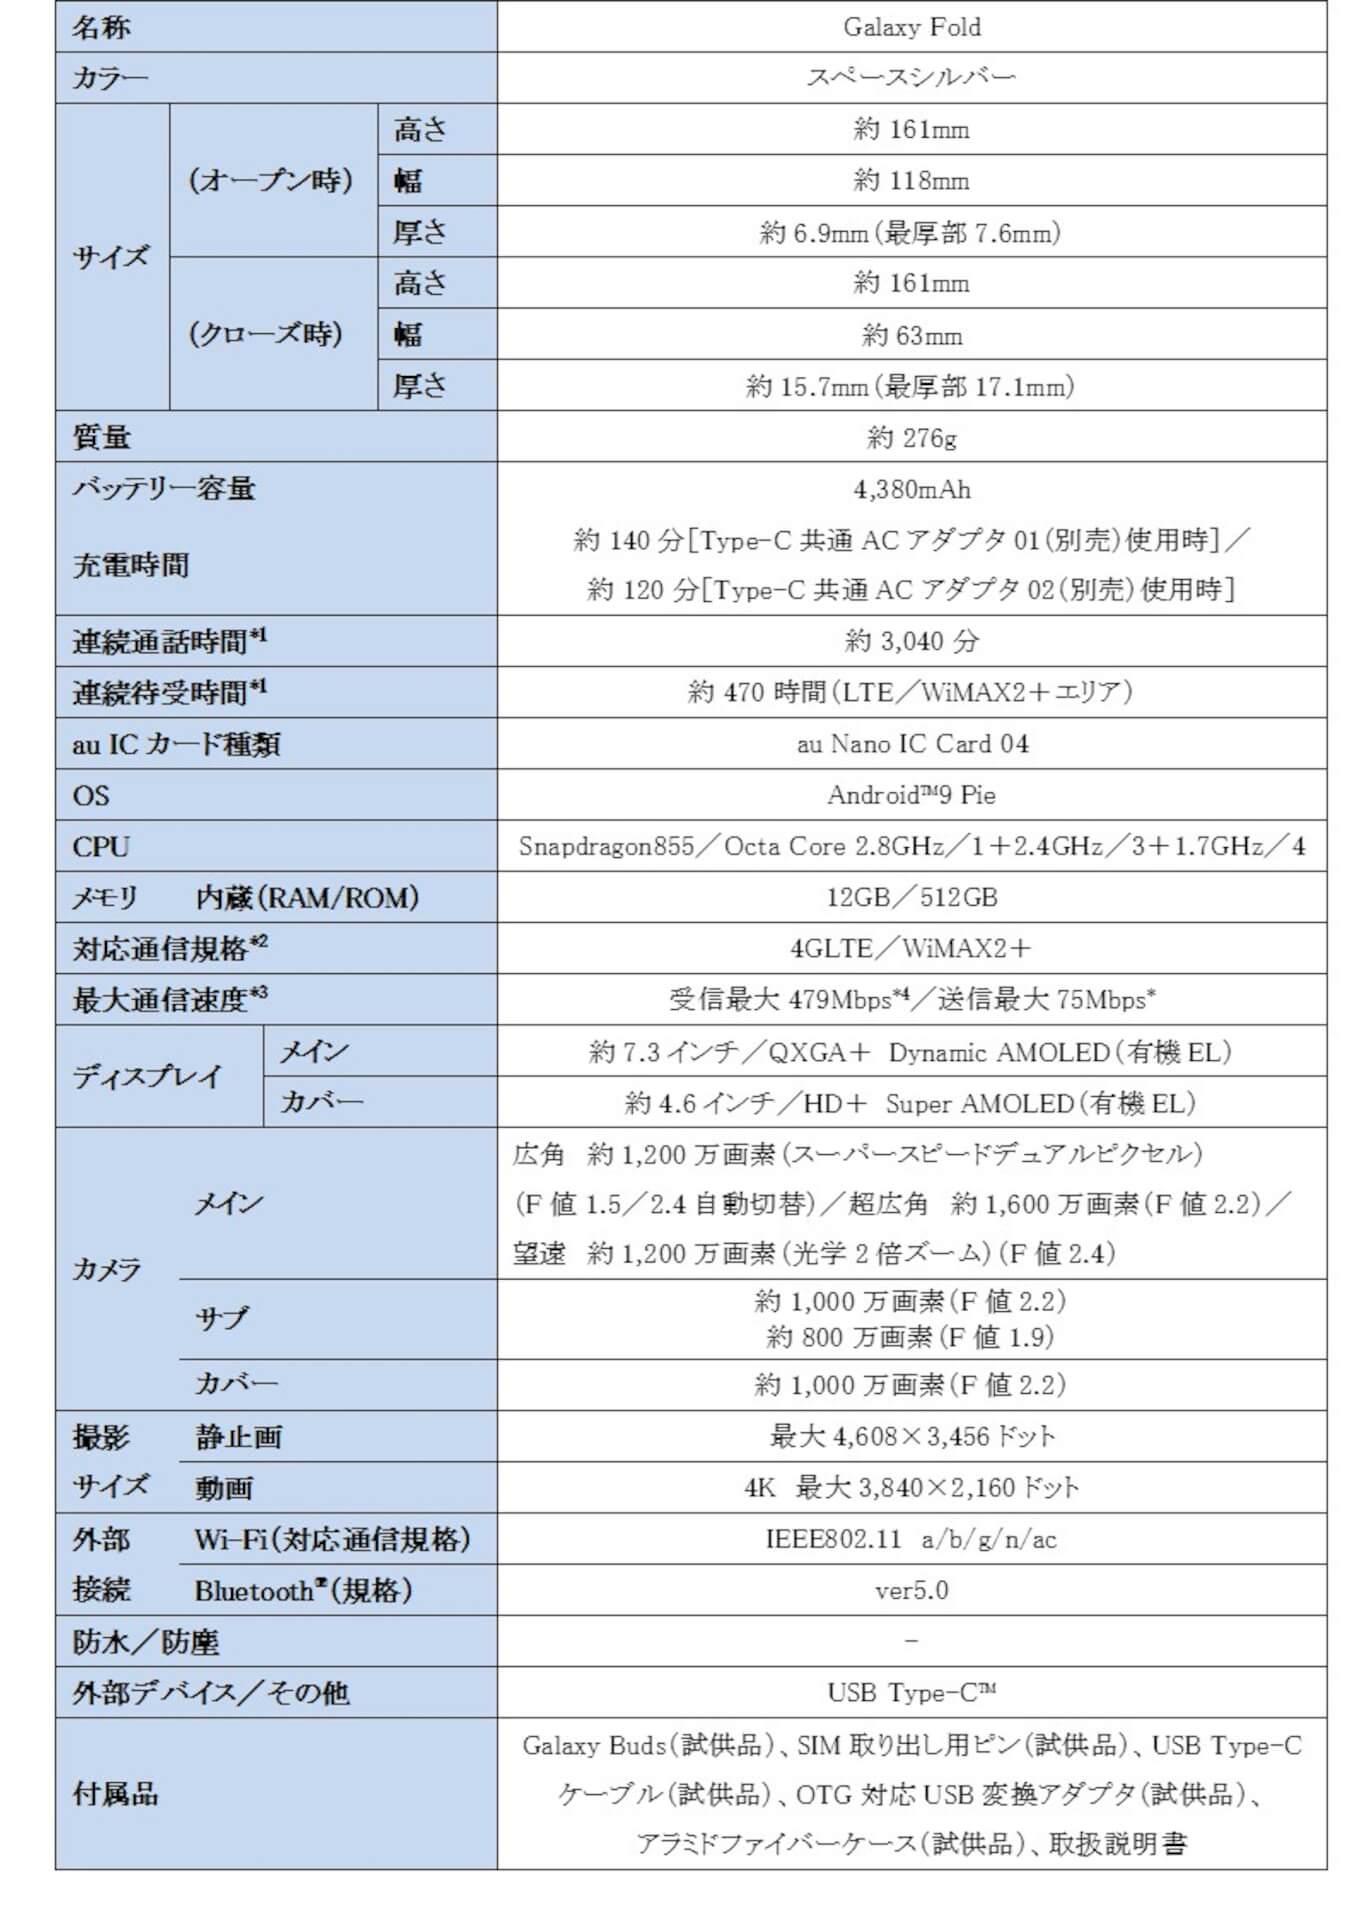 Galaxy Foldがついに日本で発売!au、Galaxy Harajukuなどで10月25日に販売開始 tech191010_galaxyfold_japan_3